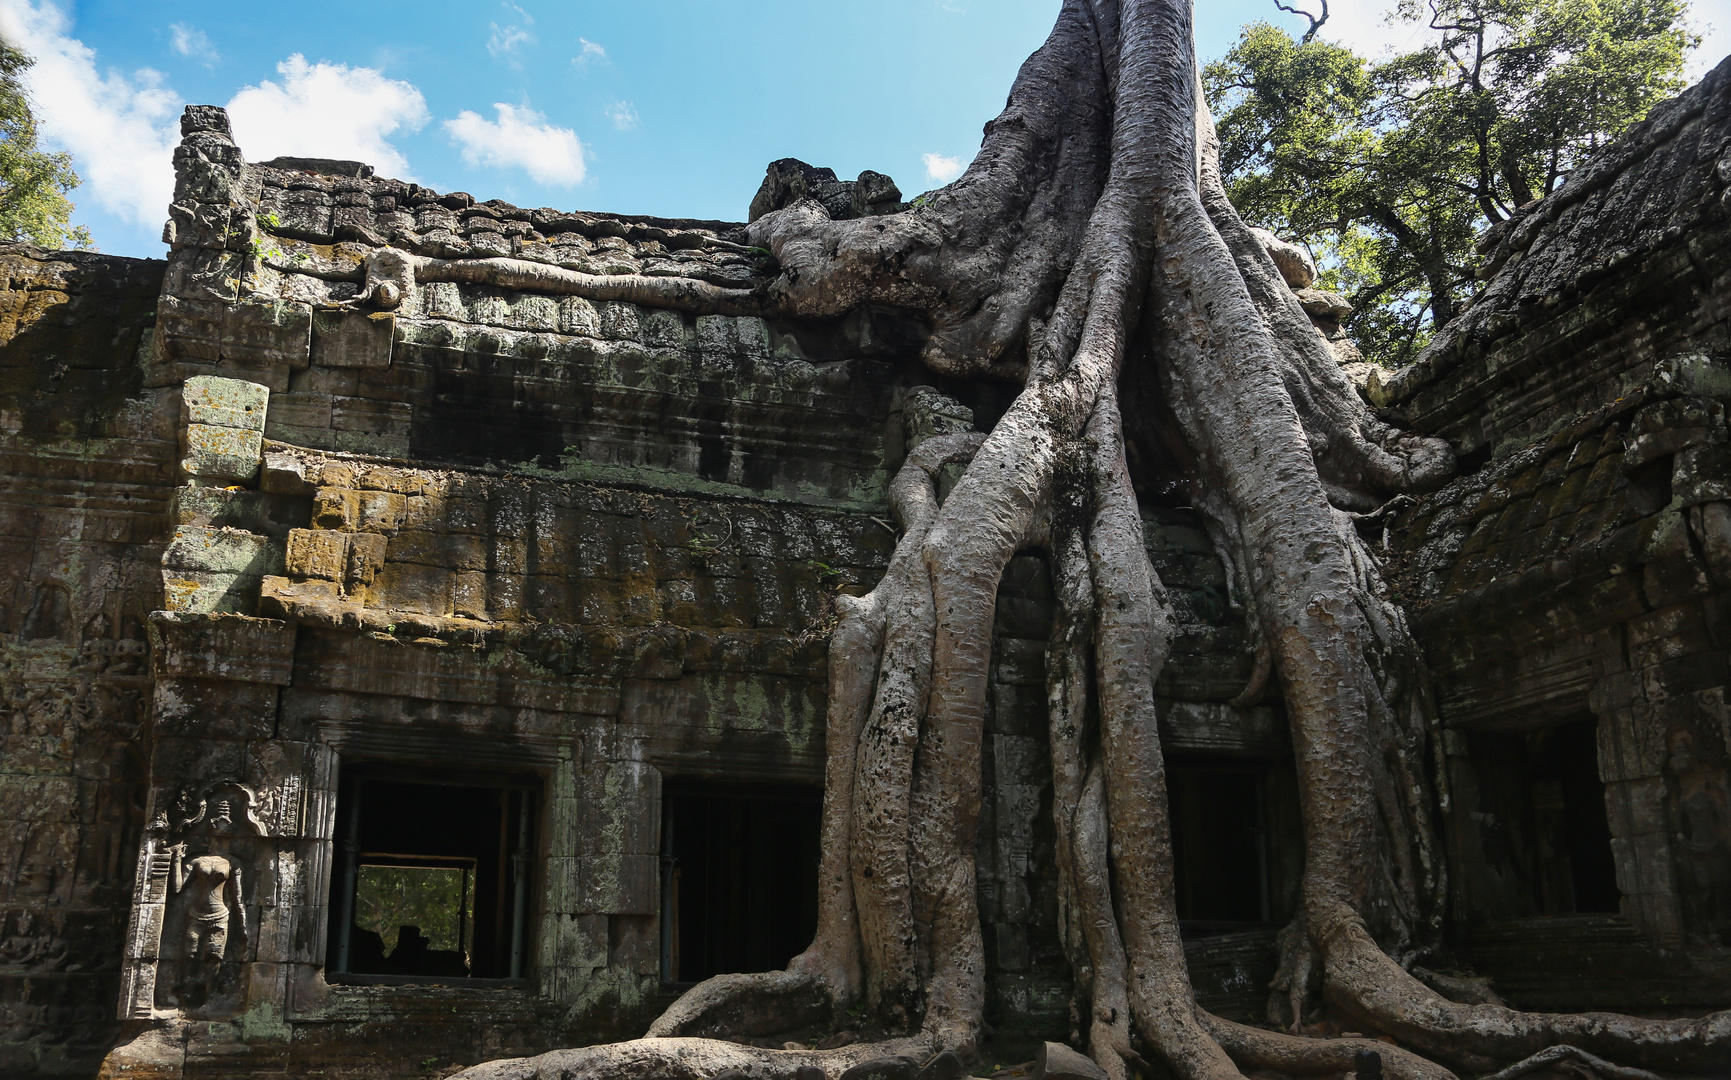 Angkor Tempel mit Baumwurzel